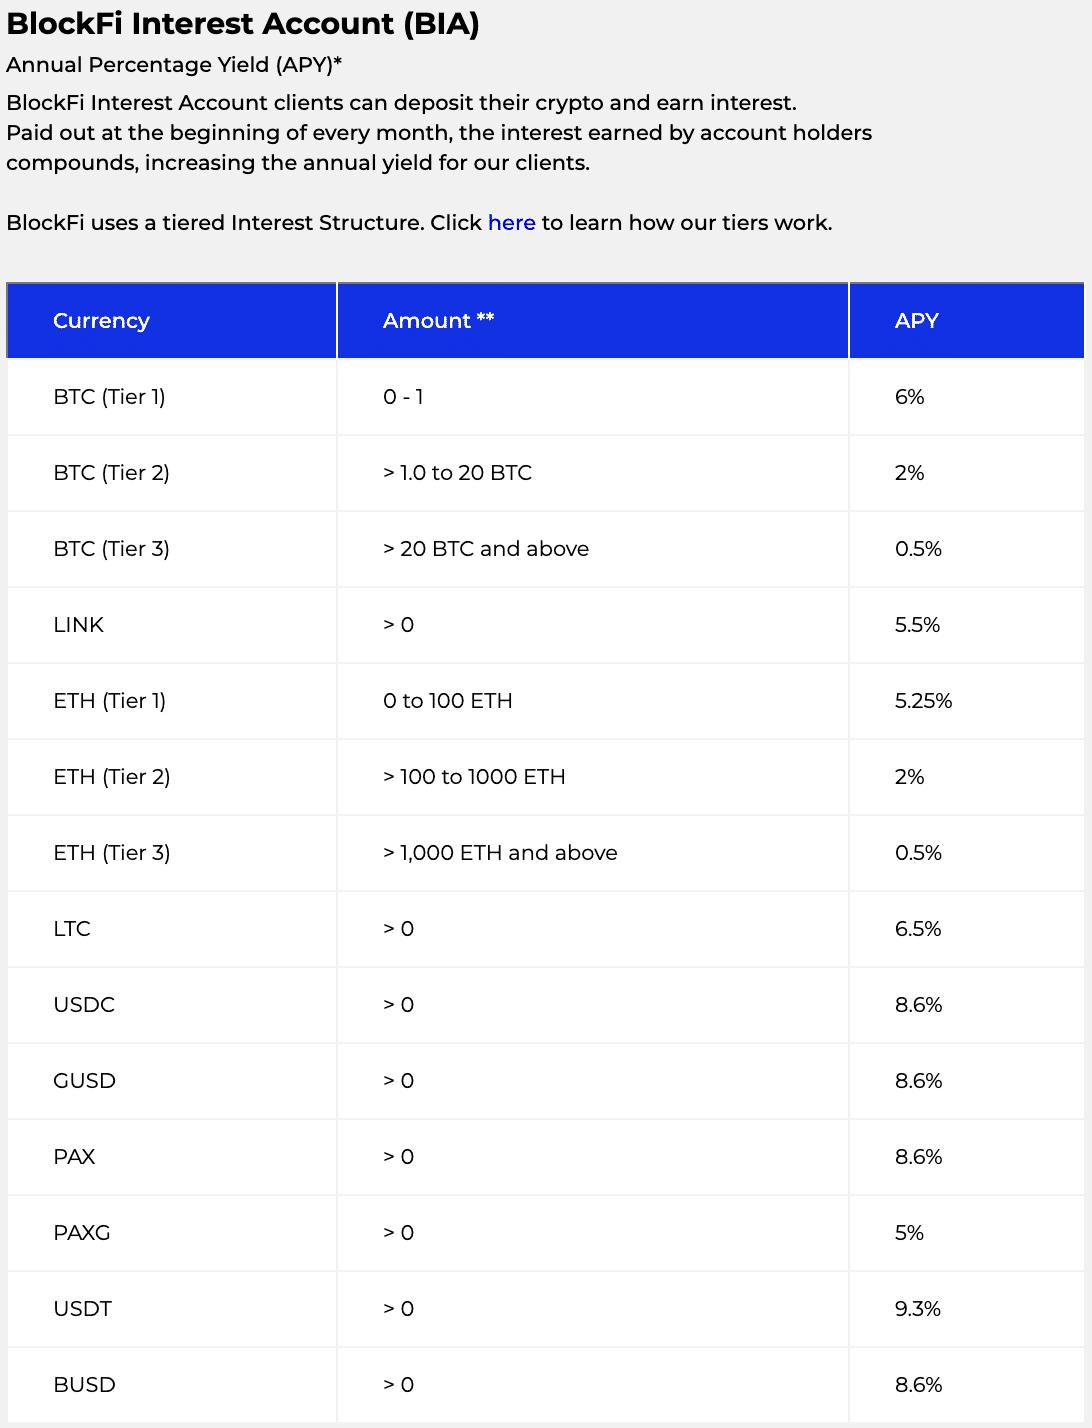 Table of BlockFi Interest Account interest rates on crypto accounts